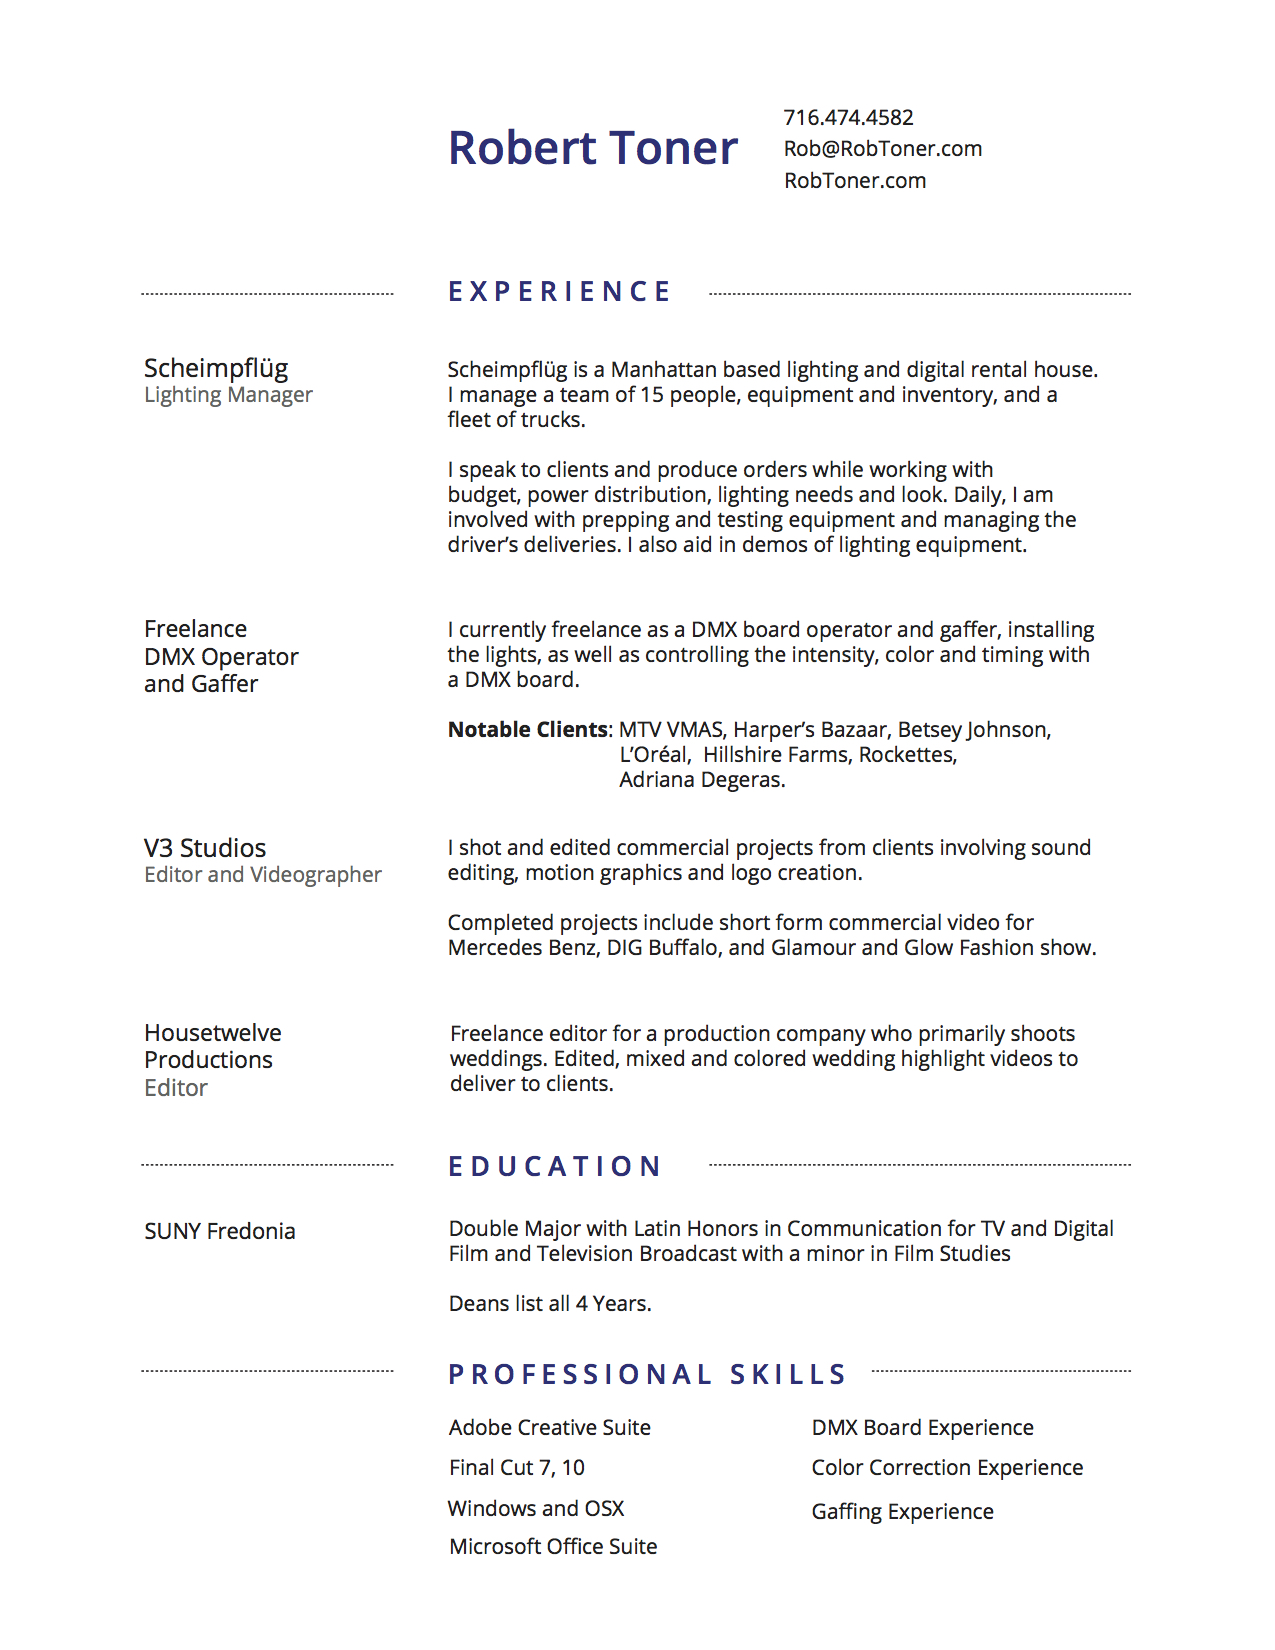 Resume Rob Toner